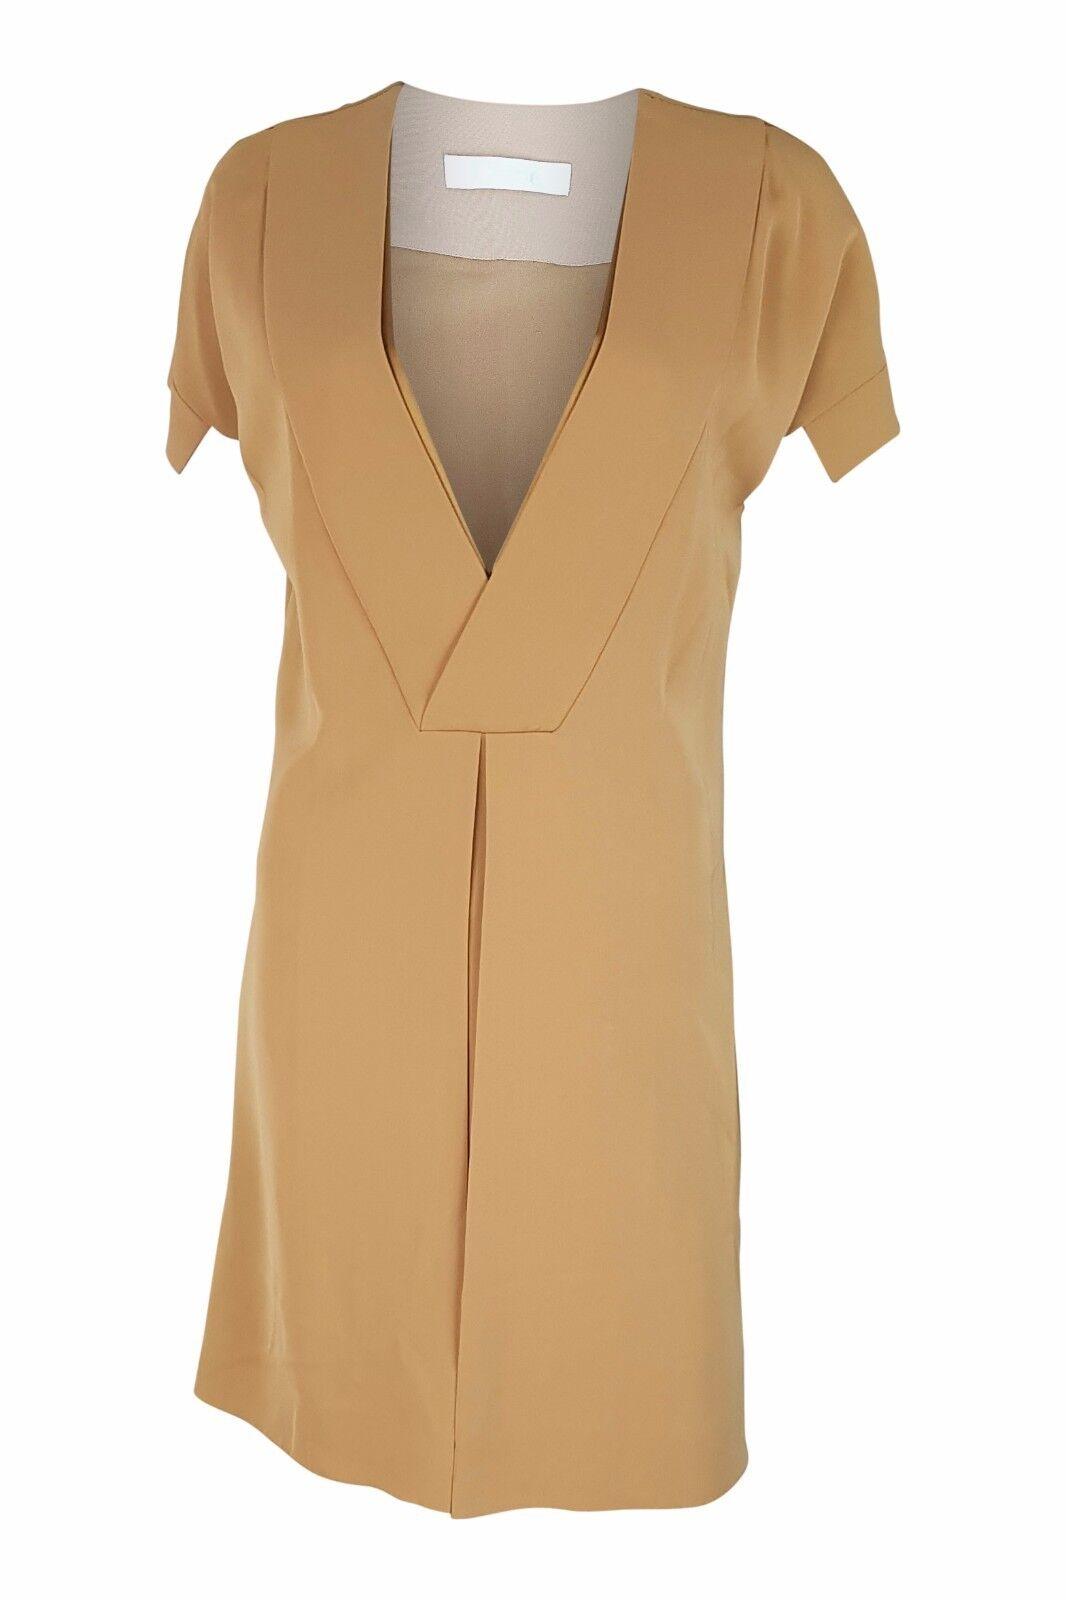 CHLOE DEEP V FRONT SILK SHIFT DRESS (10)